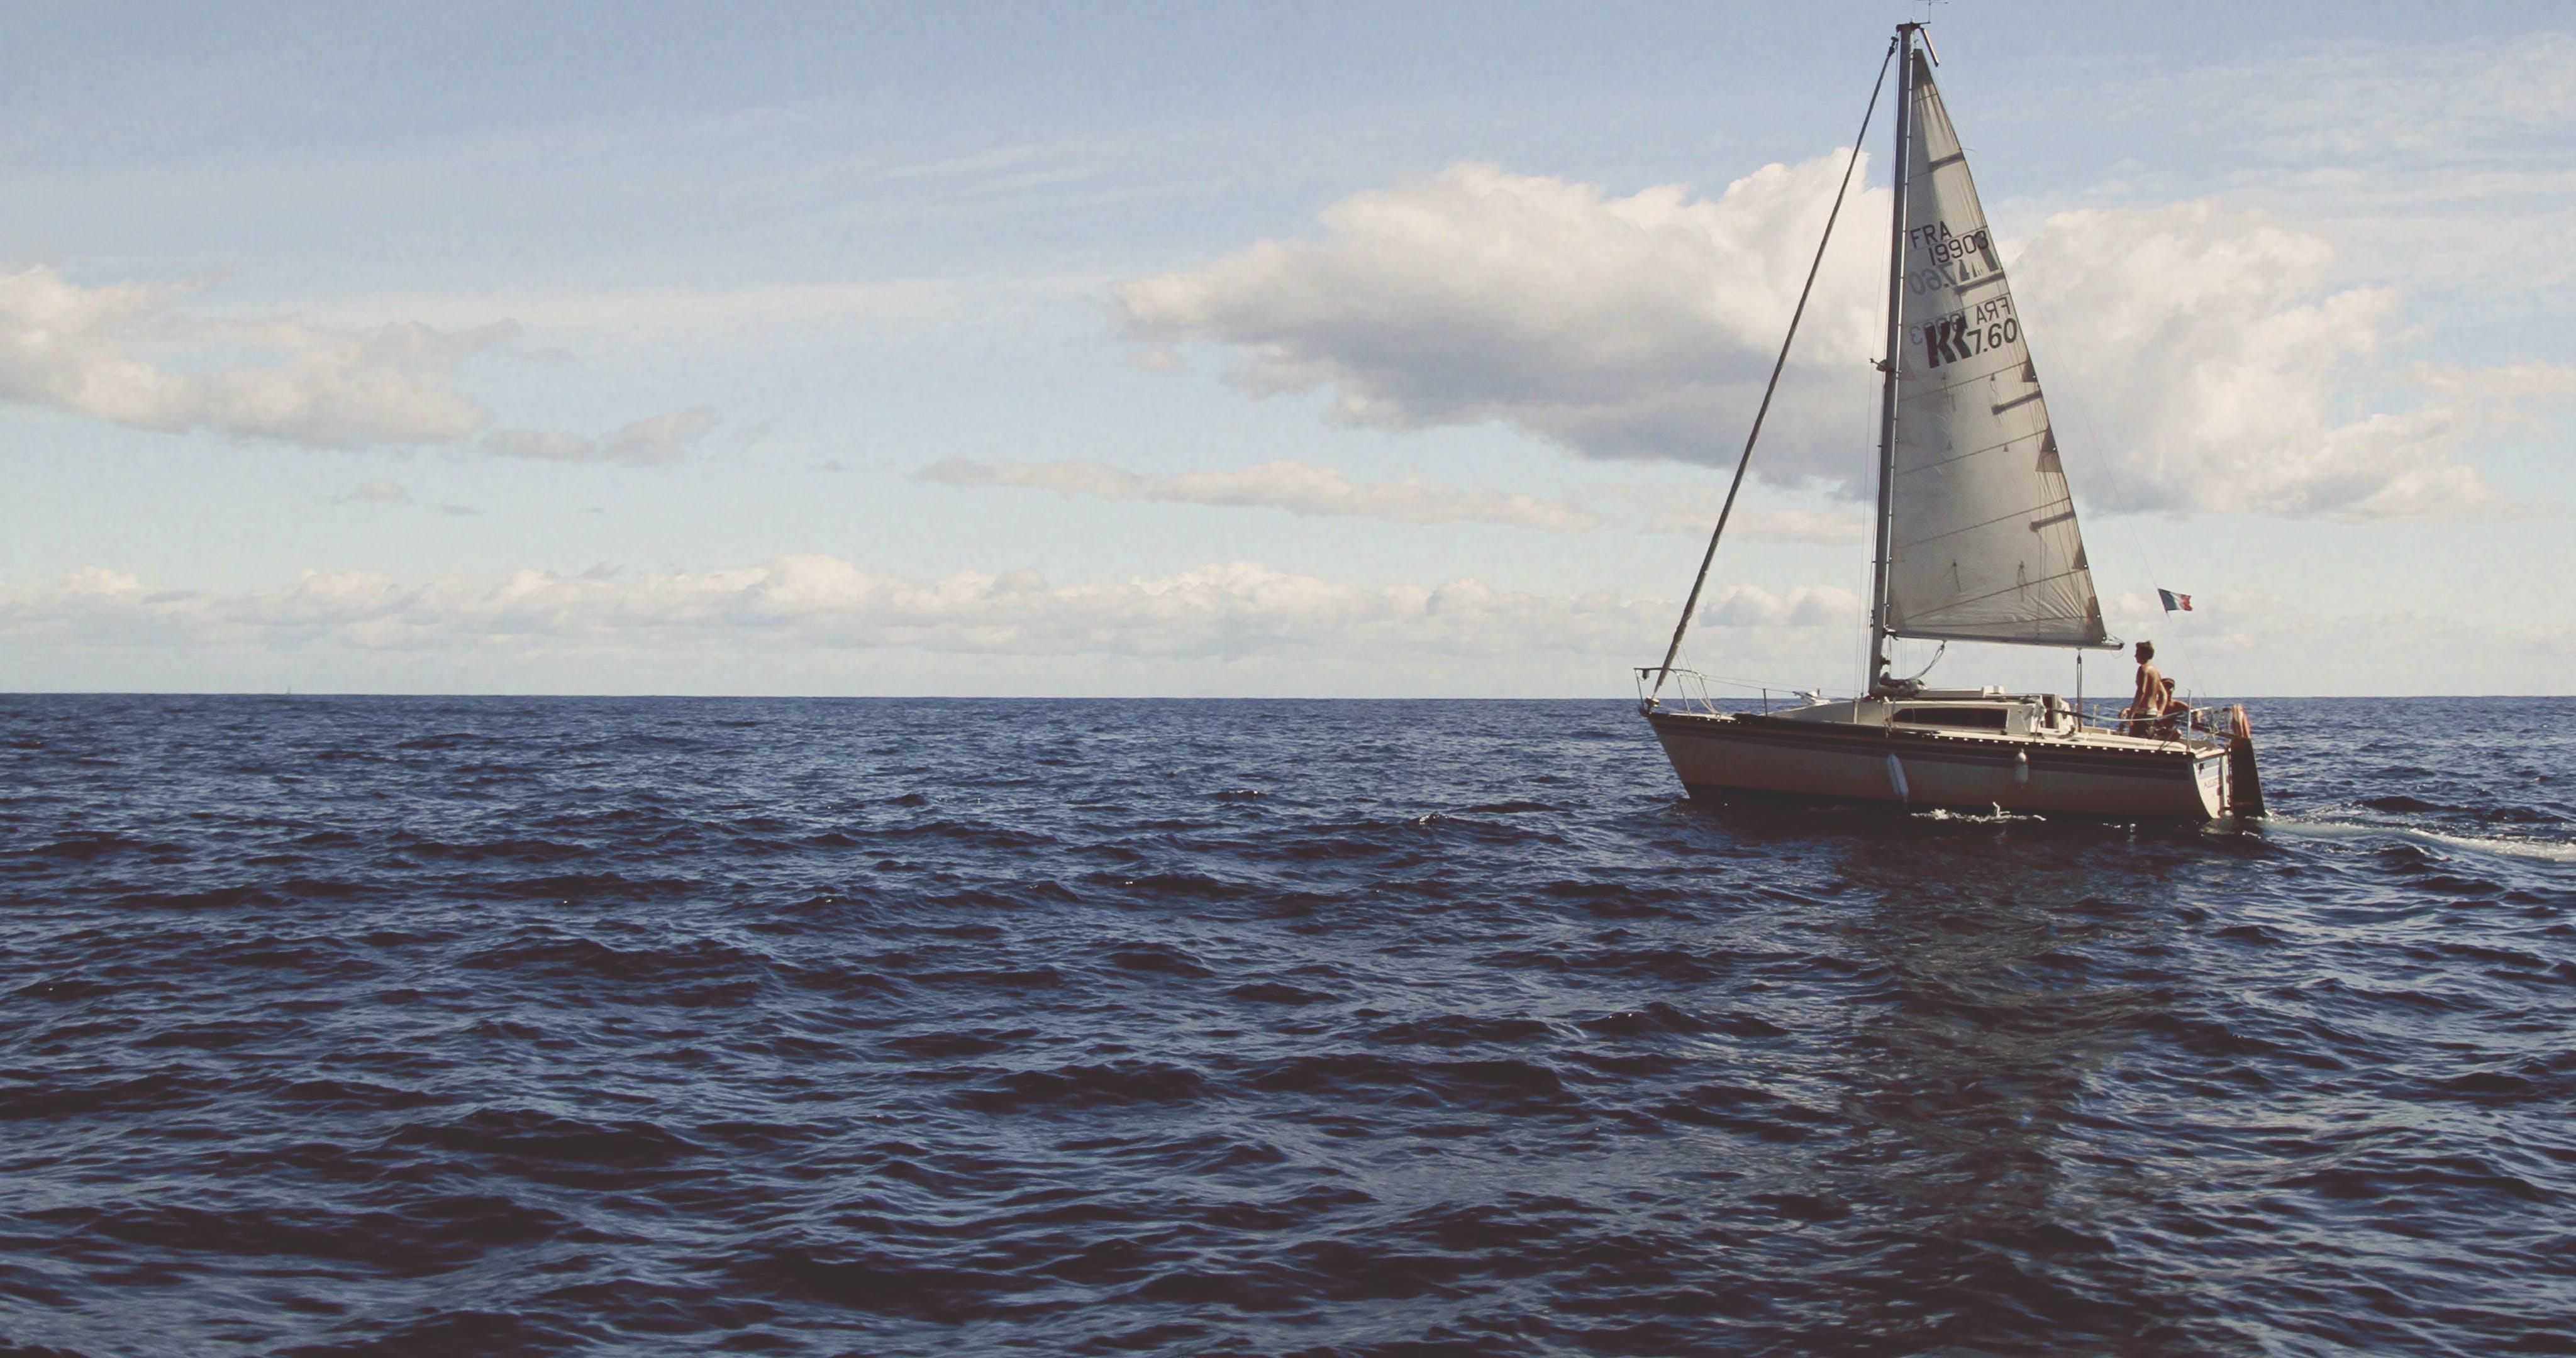 Boat in Body of Water Under Cloudy Sky